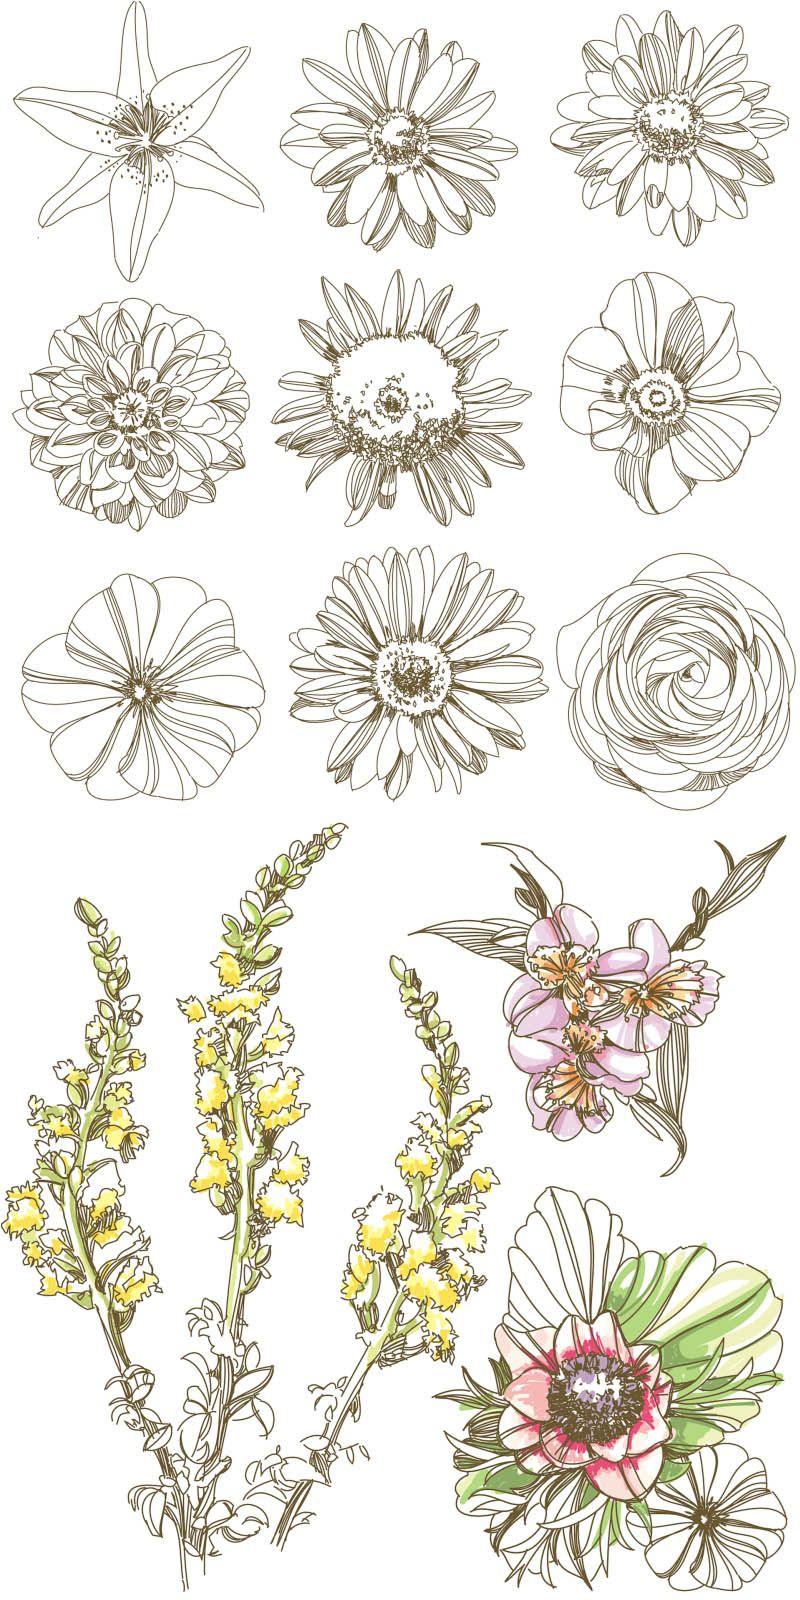 Flowers Vector Ai Eps Free Download Flower Drawing Vintage Flower Tattoo Flower Art